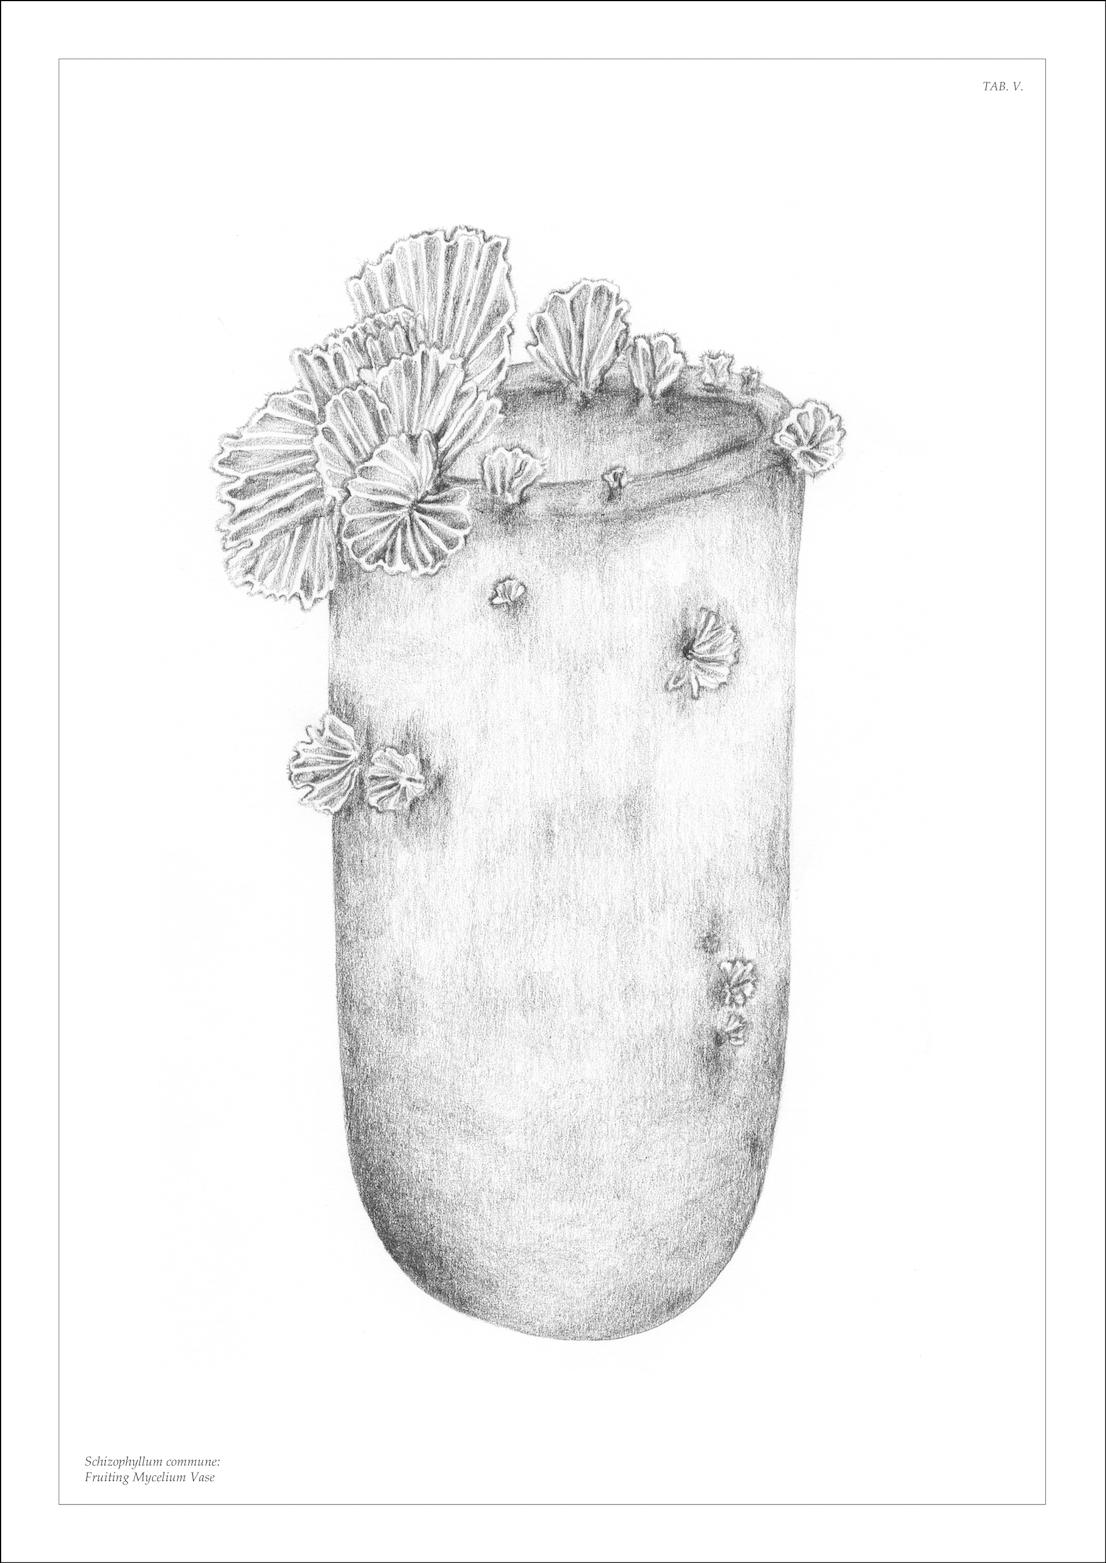 Officina Corpuscoli - Maurizio Montalti, The Growing Lab, 2014.